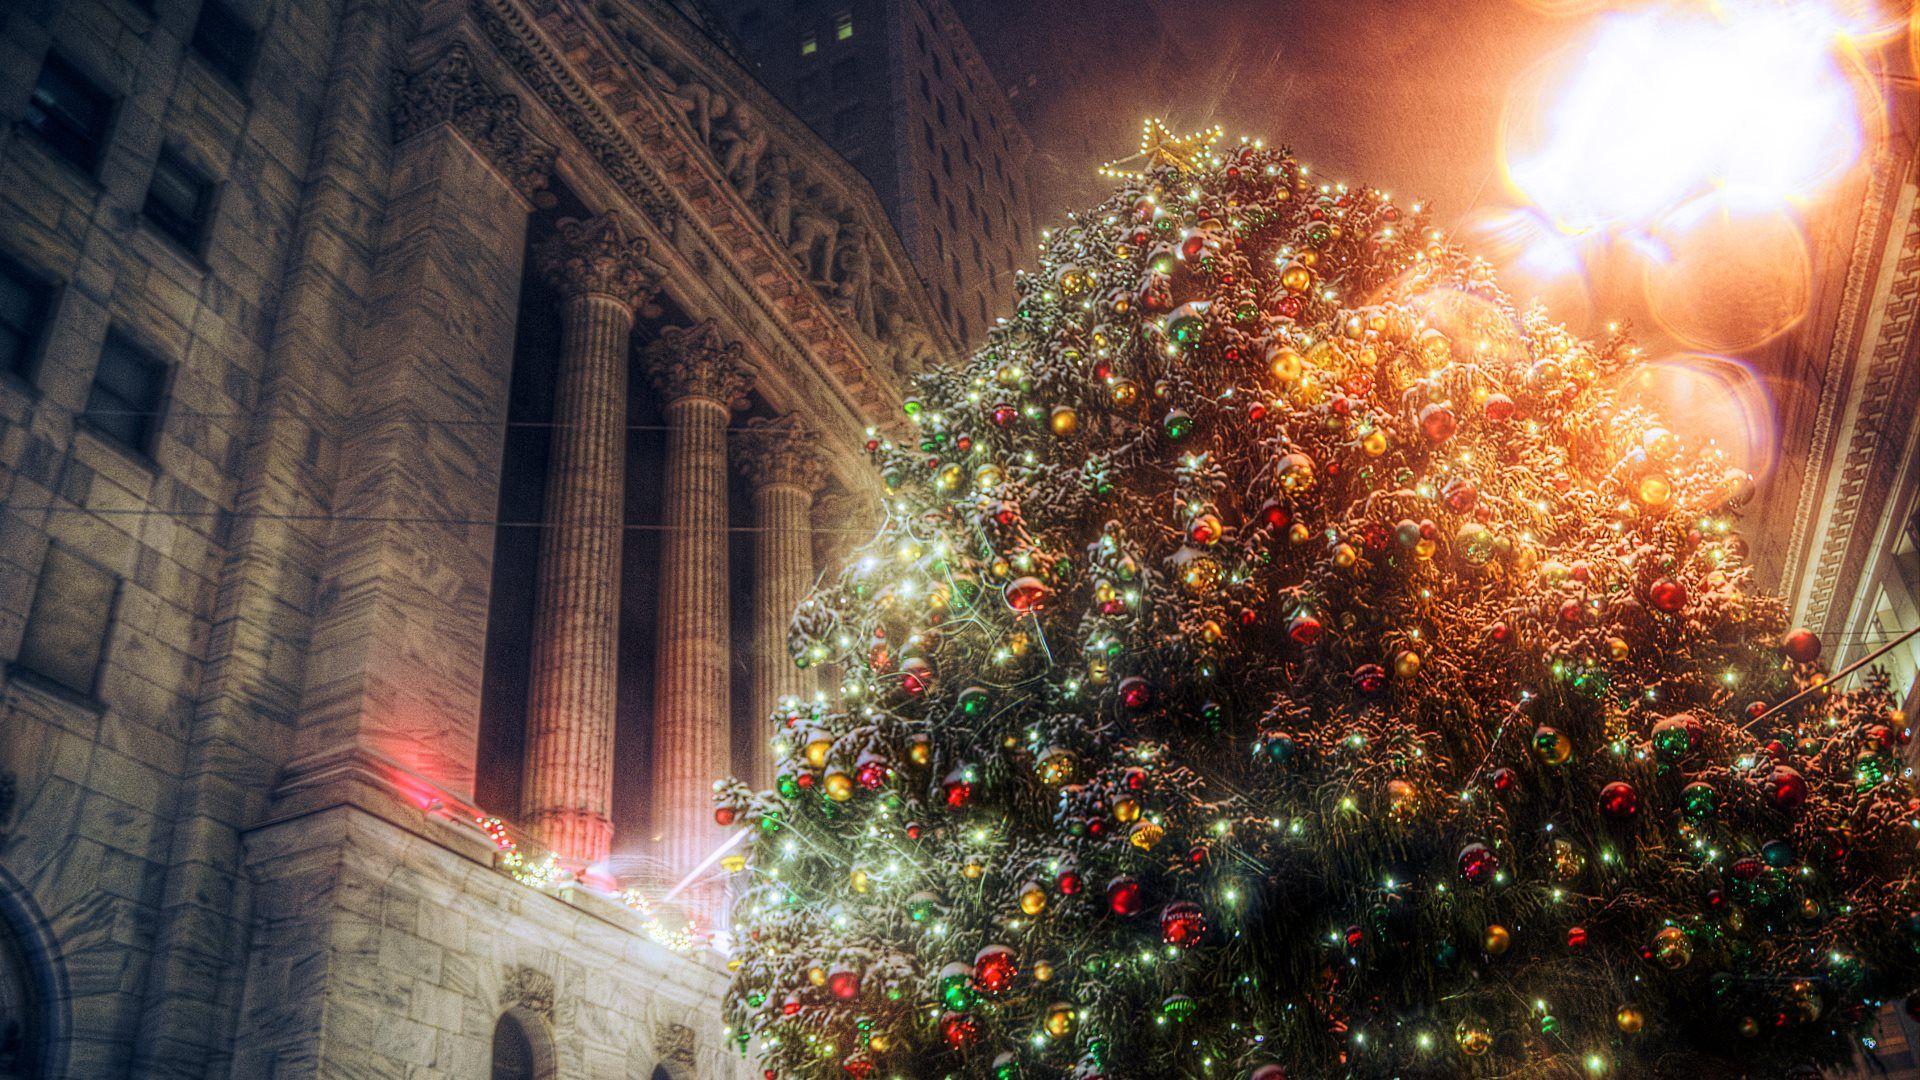 choose among our big list of beautiful widescreen christmas